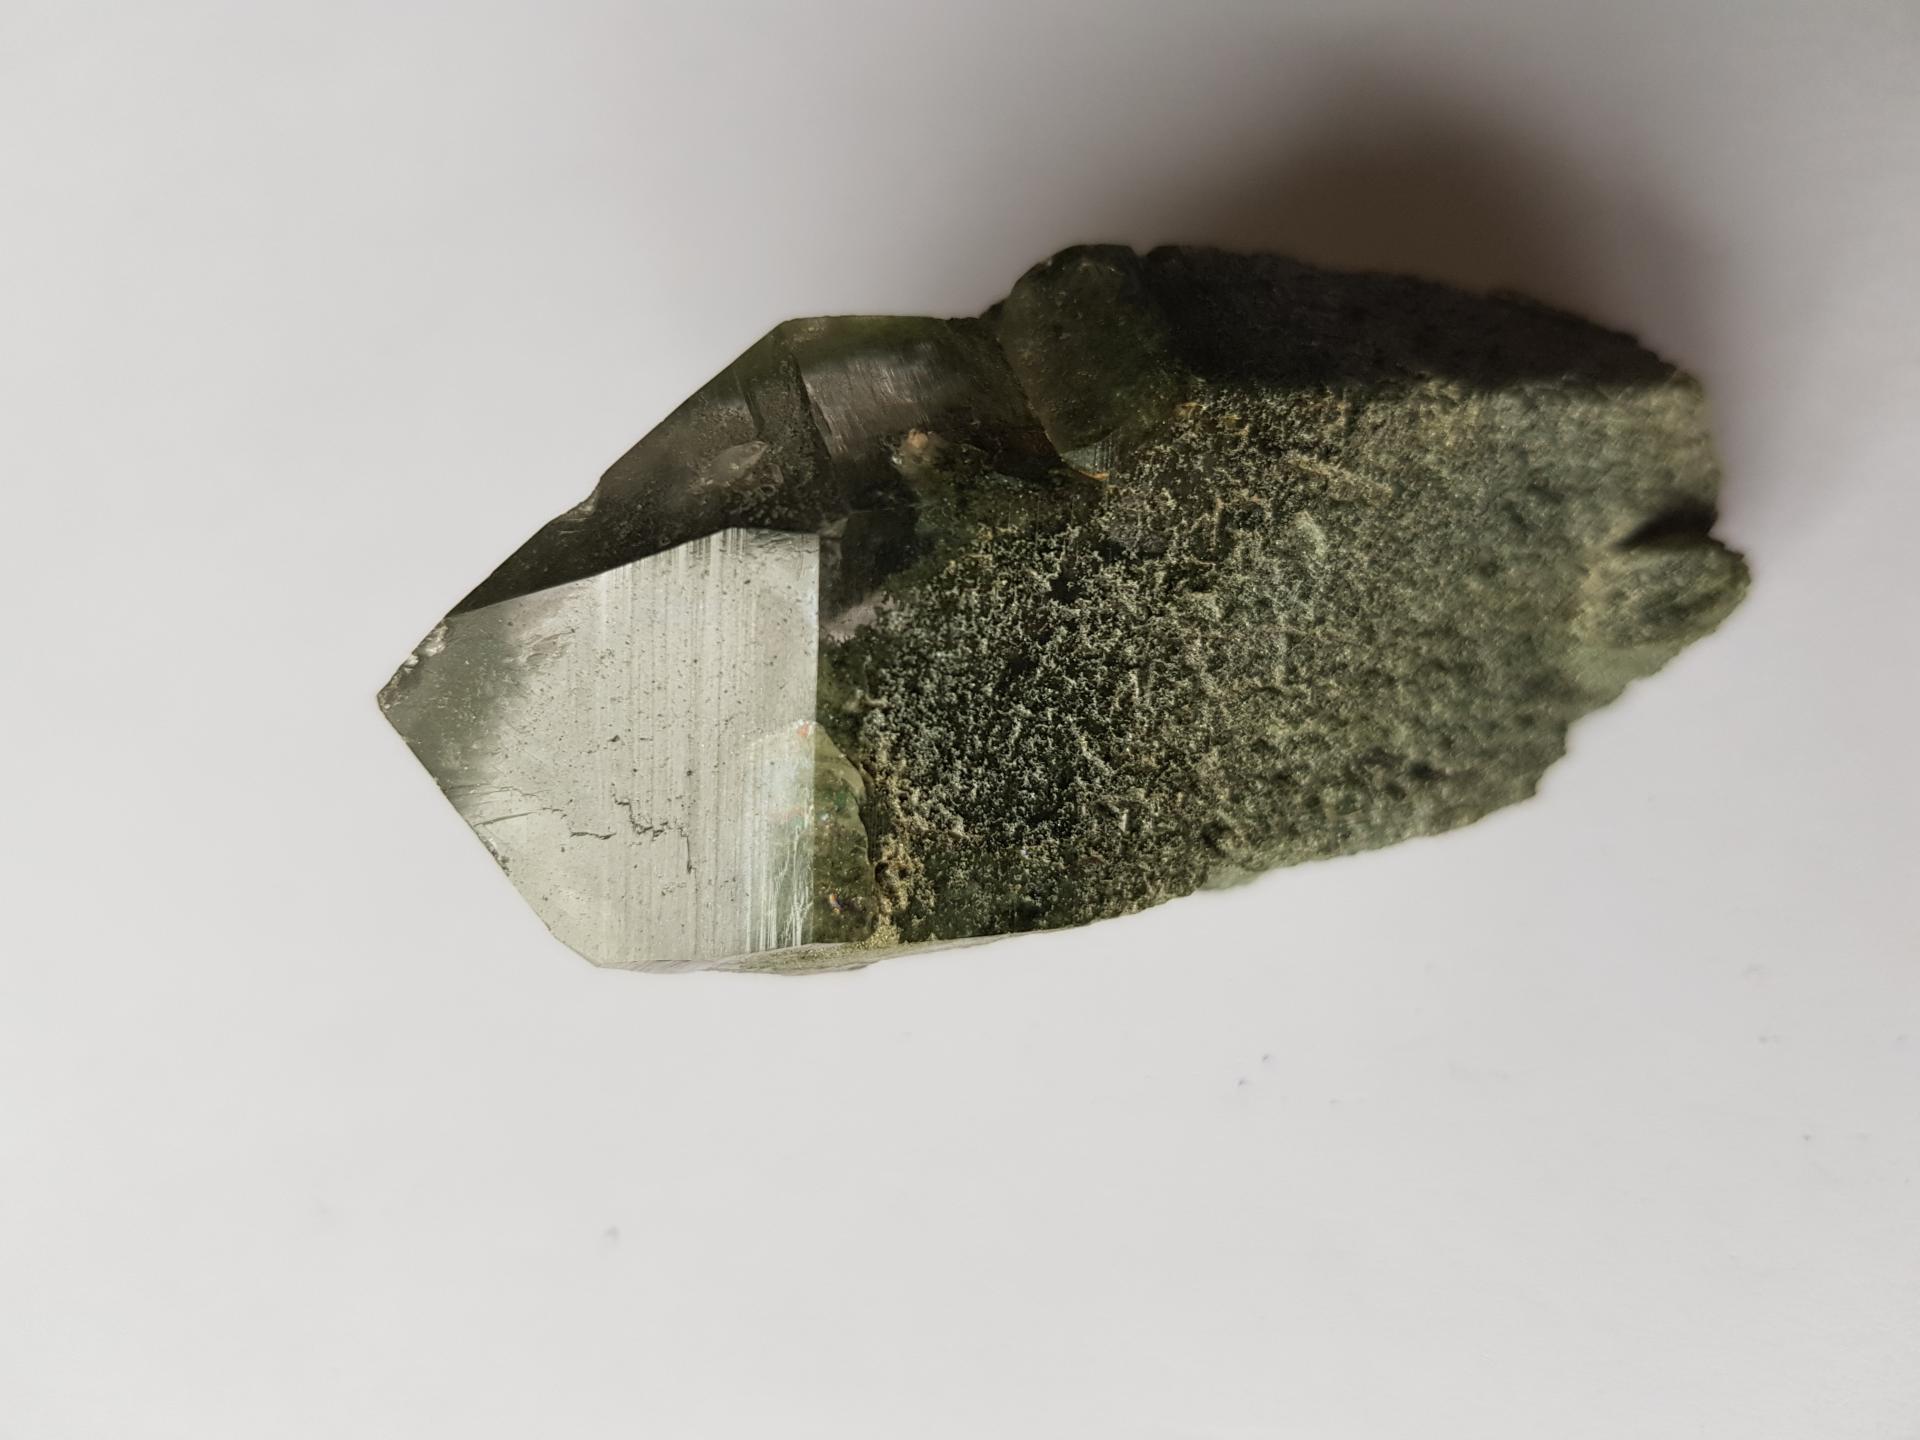 Pointe de cristal de roche chlorite